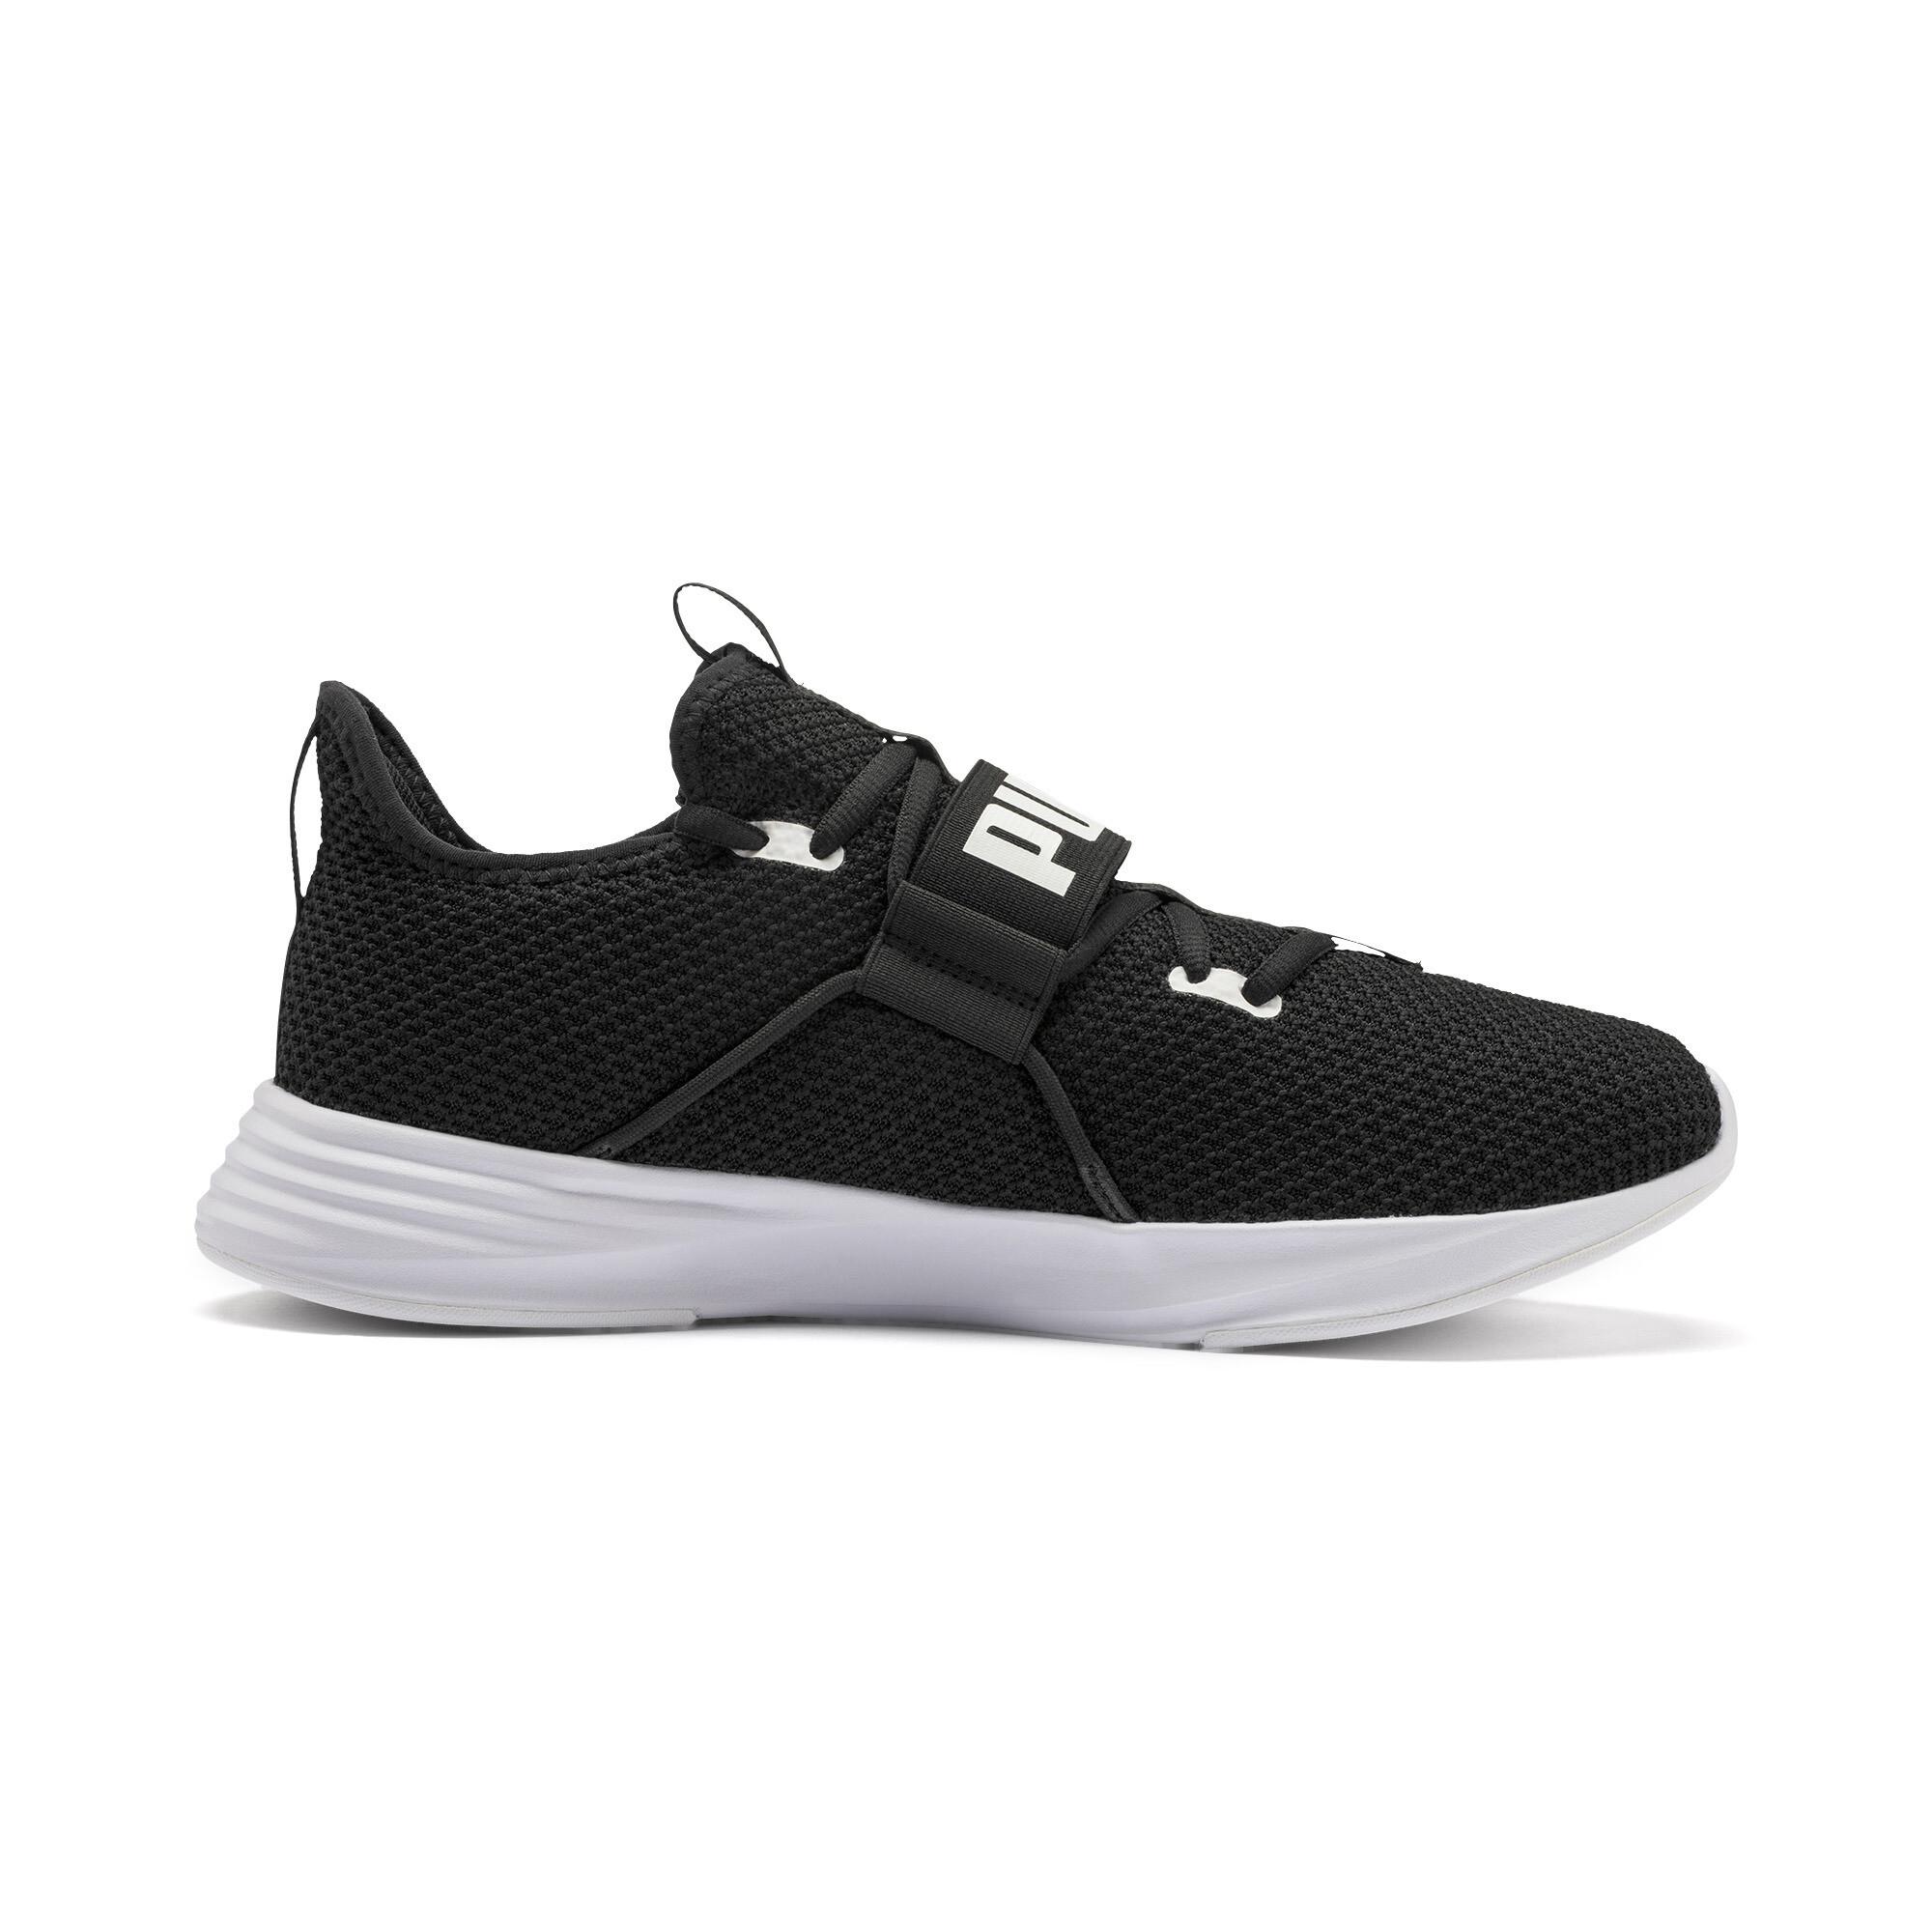 PUMA-Men-039-s-Persist-XT-Knit-Training-Shoes thumbnail 7